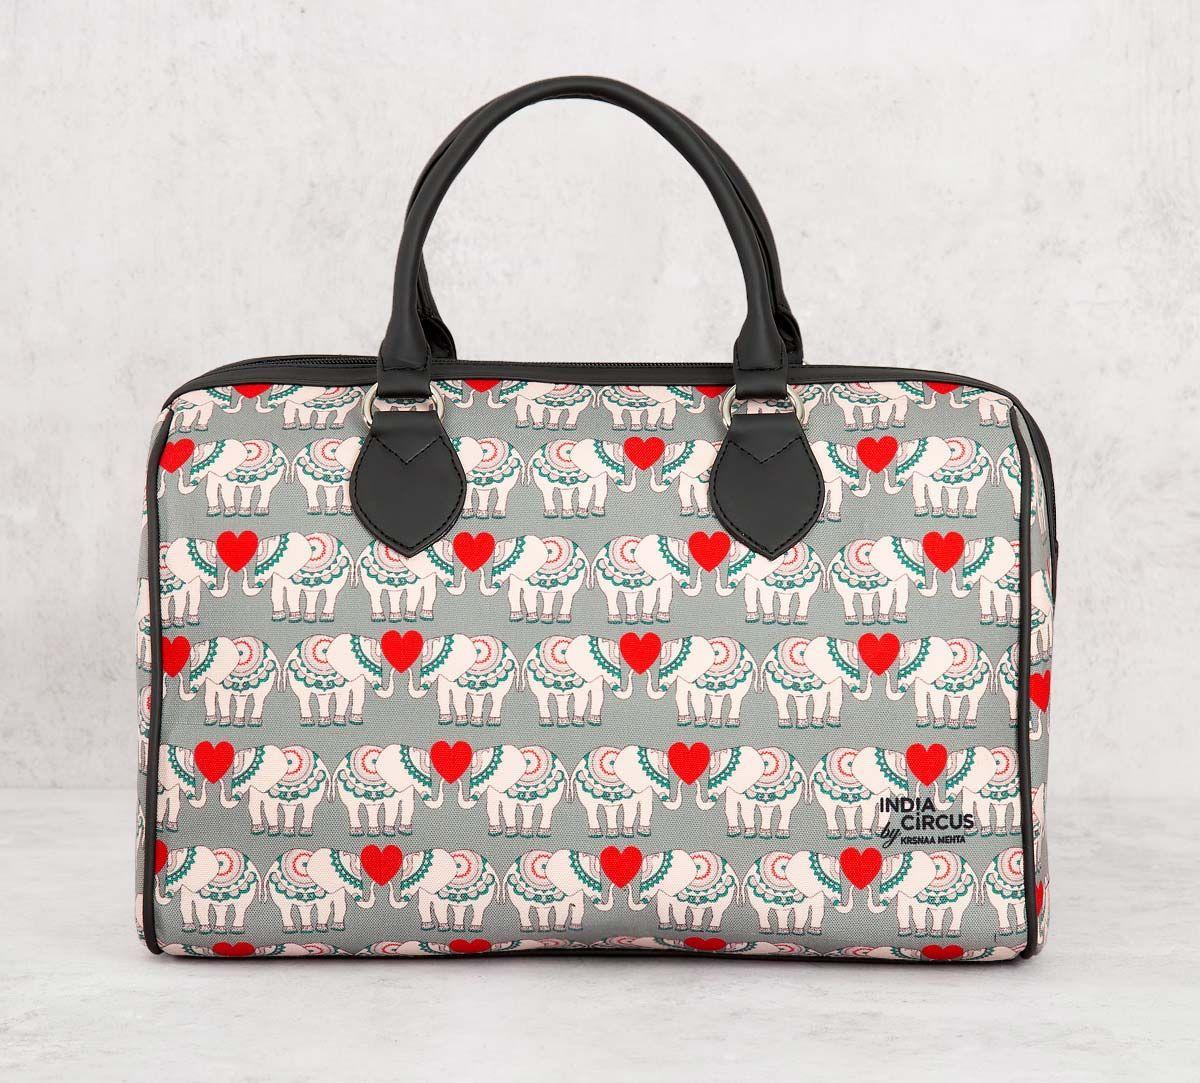 India Circus Heart Tusker Duffle Bag